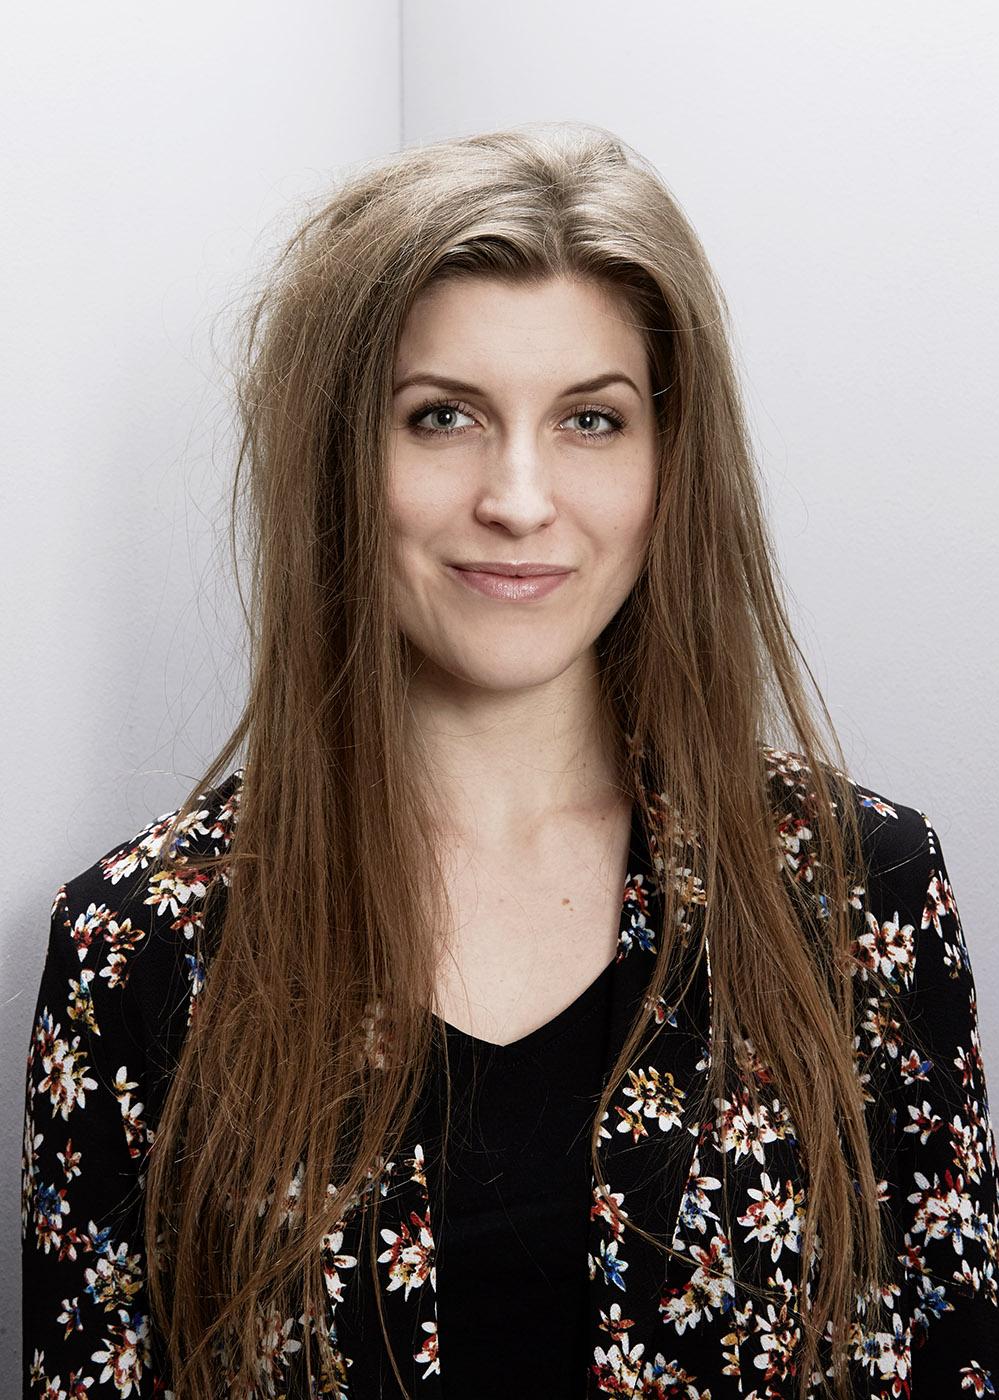 Elise Runsuun, Musical Performer